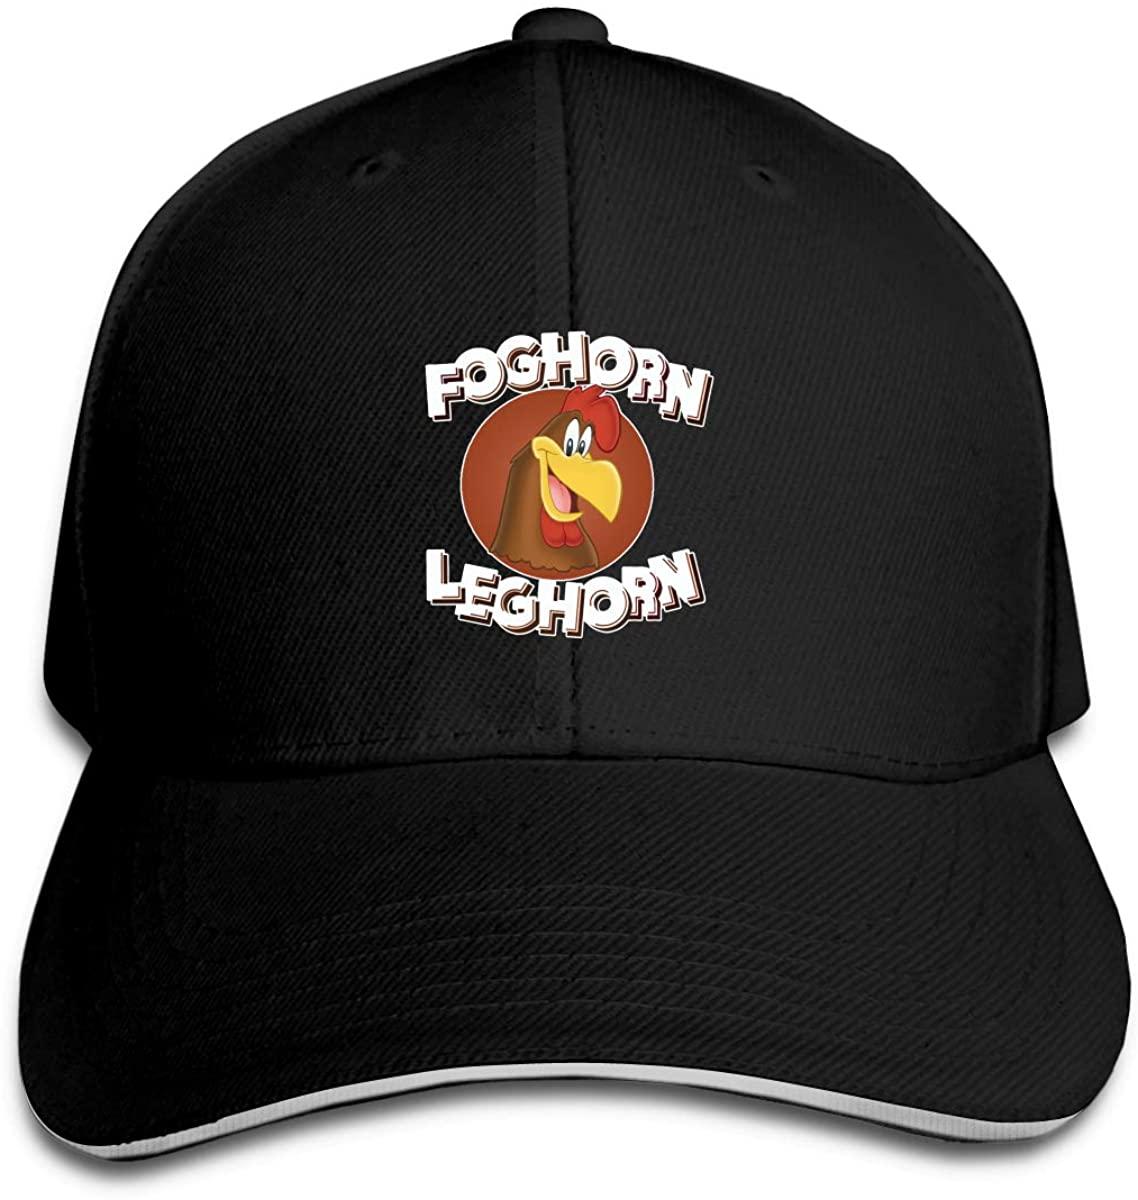 N/D Foghorn Leghorn Looney Tunes Men Womens Baseball Cap Washed Cotton Adjustable Hat